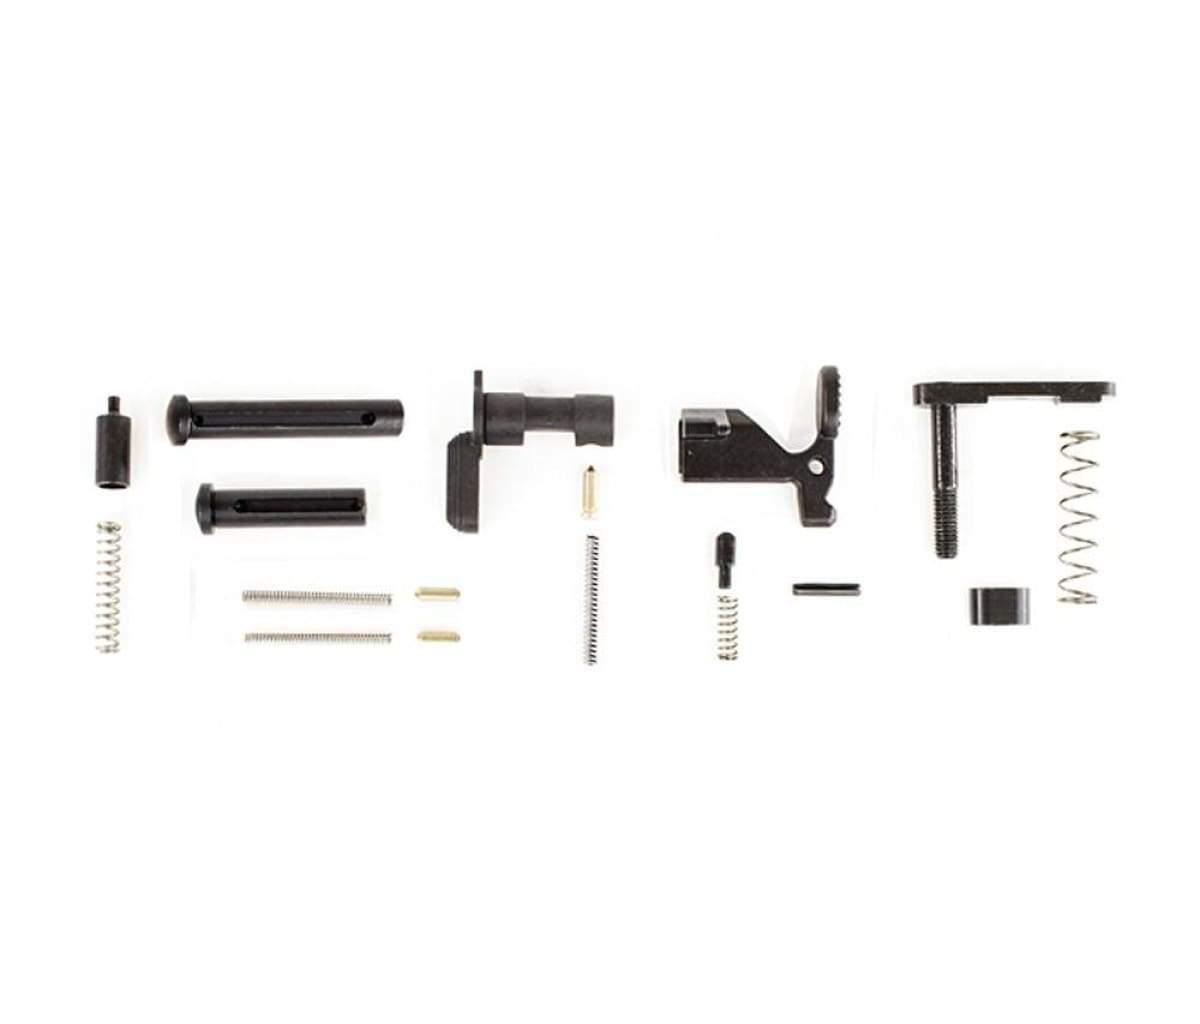 Aero Precision - AR-15 Lower Parts Kit, Minus FCG/Trigger Guard/Pistol Grip